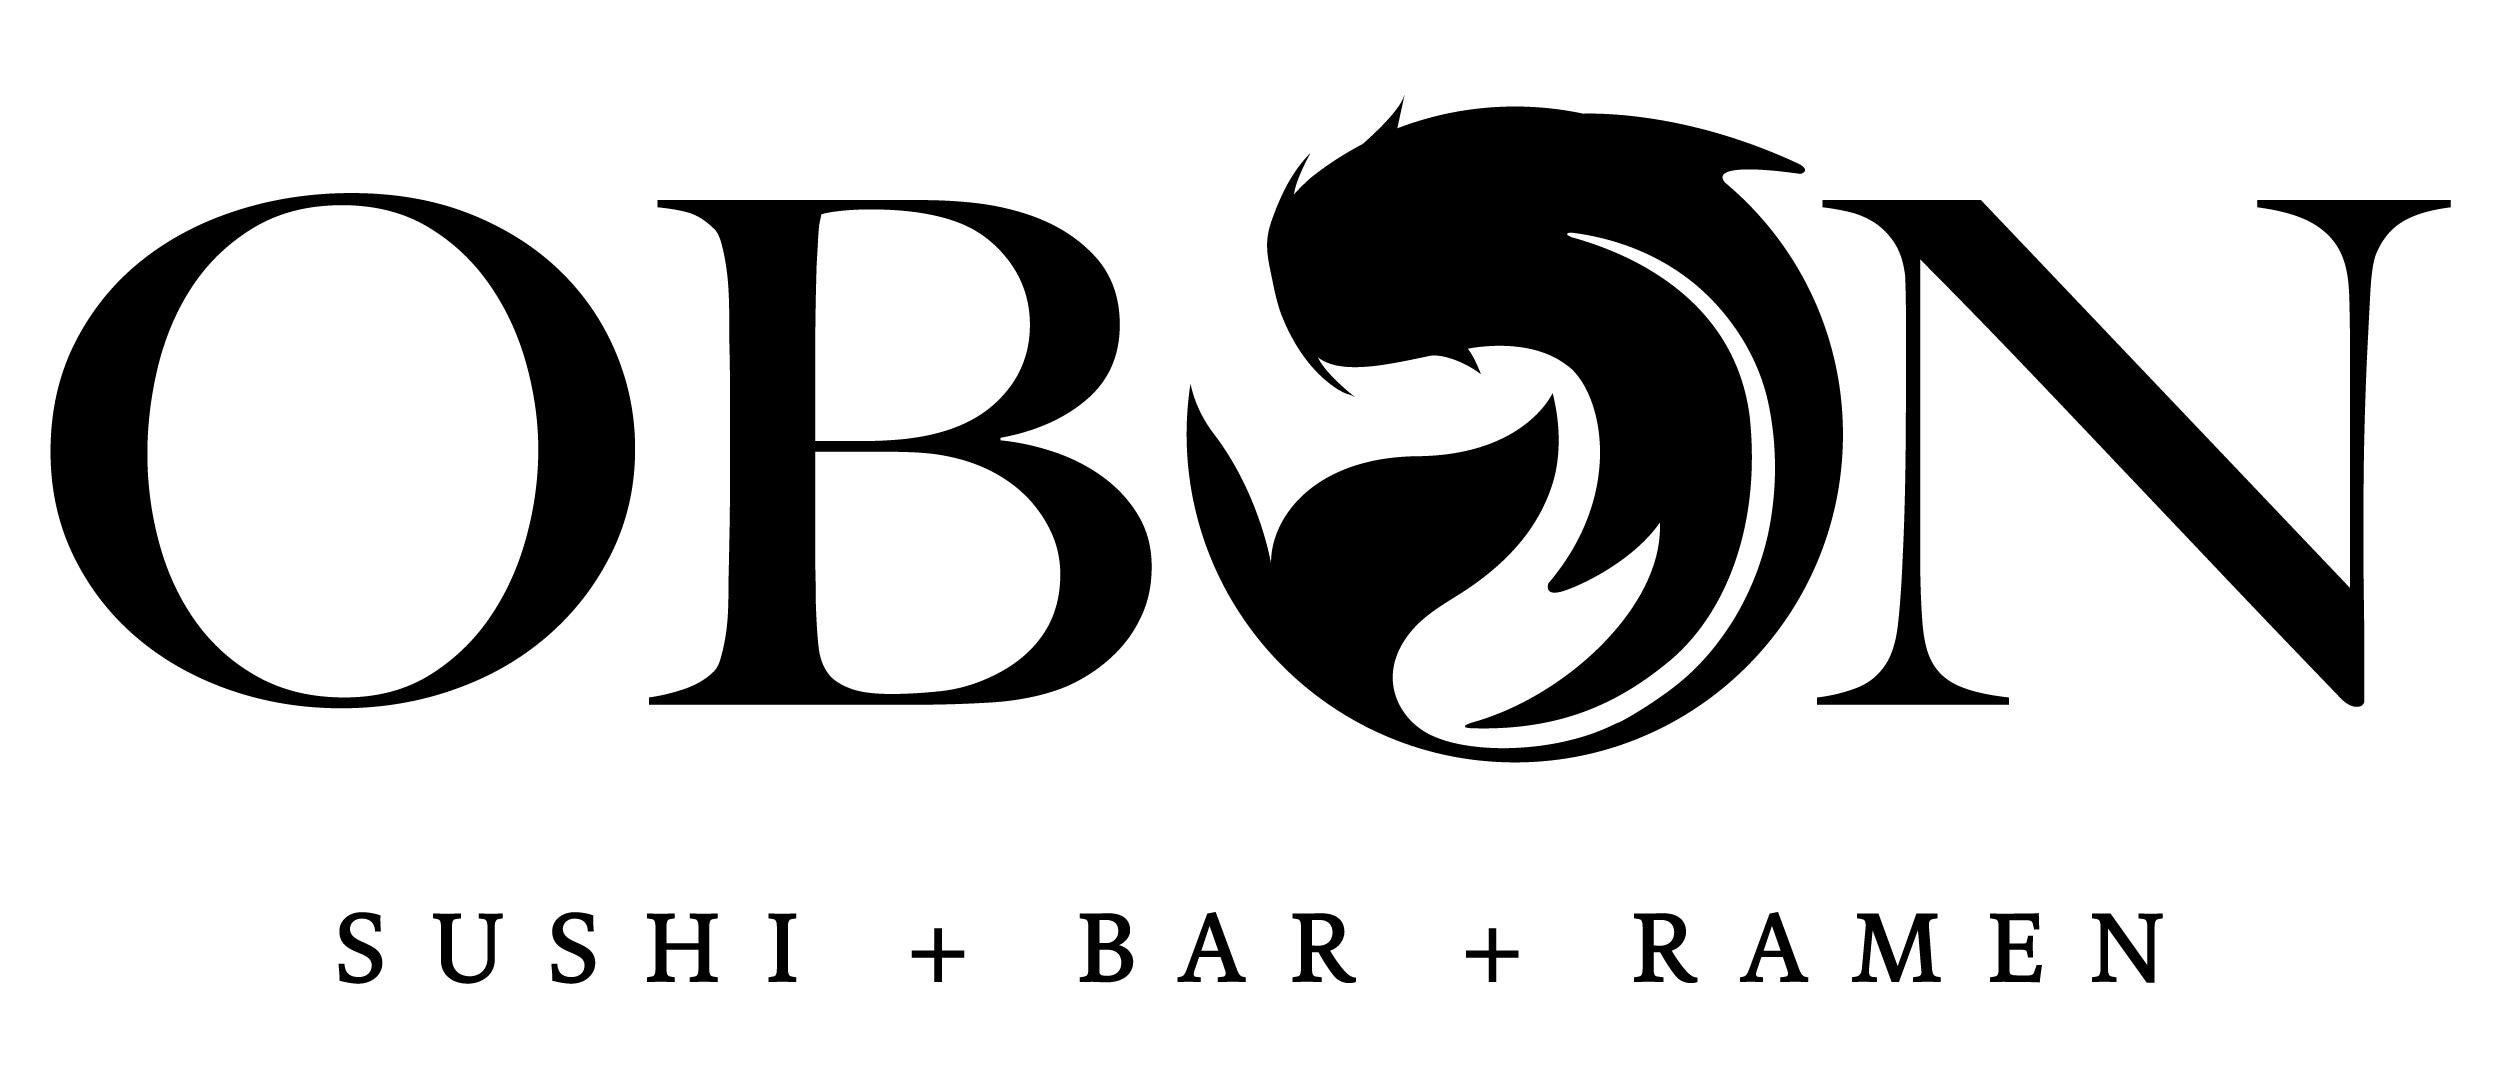 Obon-Logo-Black - Nick Creamer.png